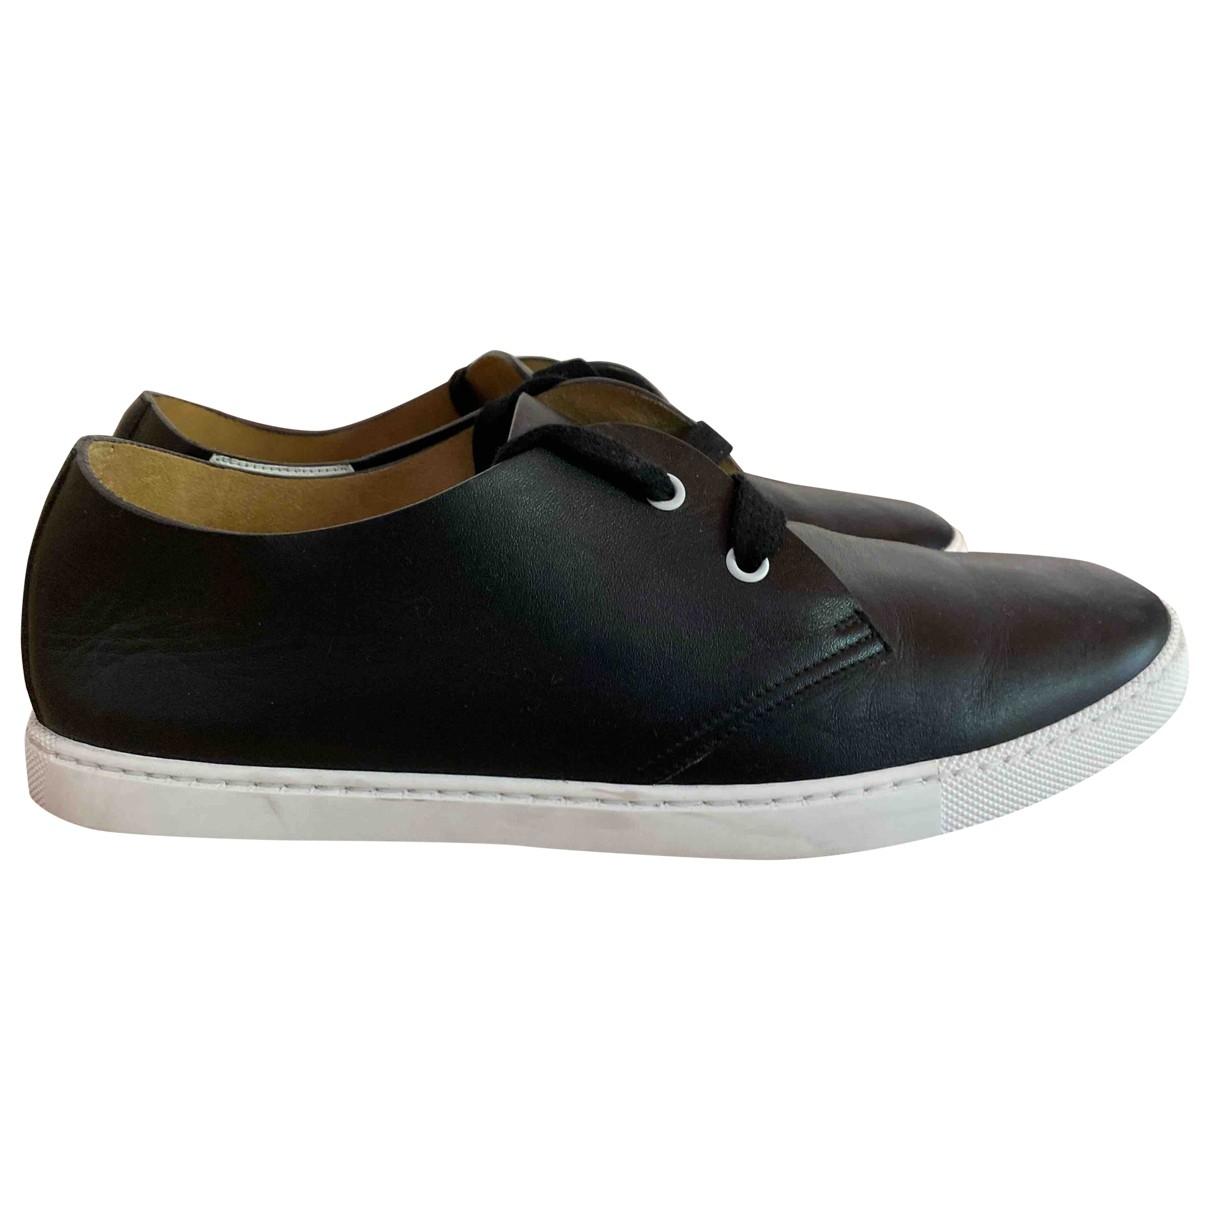 Hermès \N Black Leather Trainers for Men 42 EU